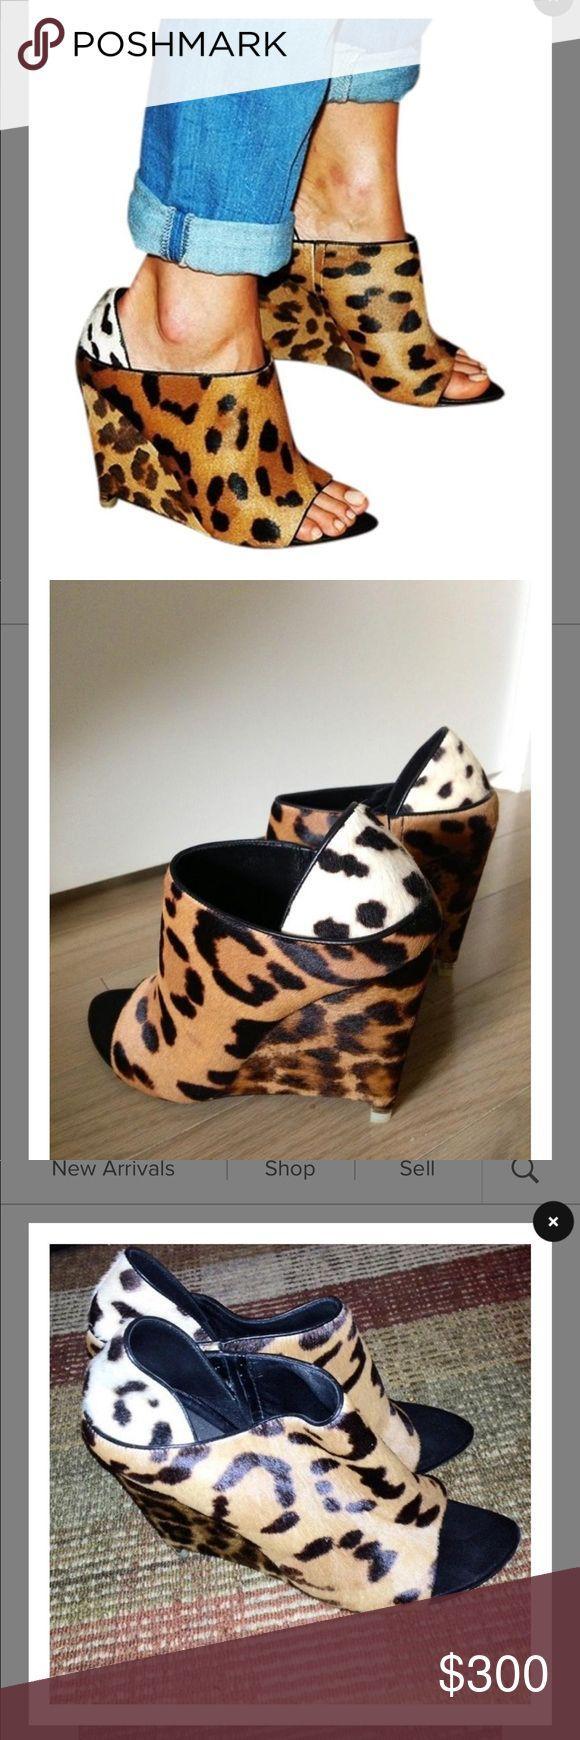 Alexander wang animal print peep toe wedge – My Shoe Addiction